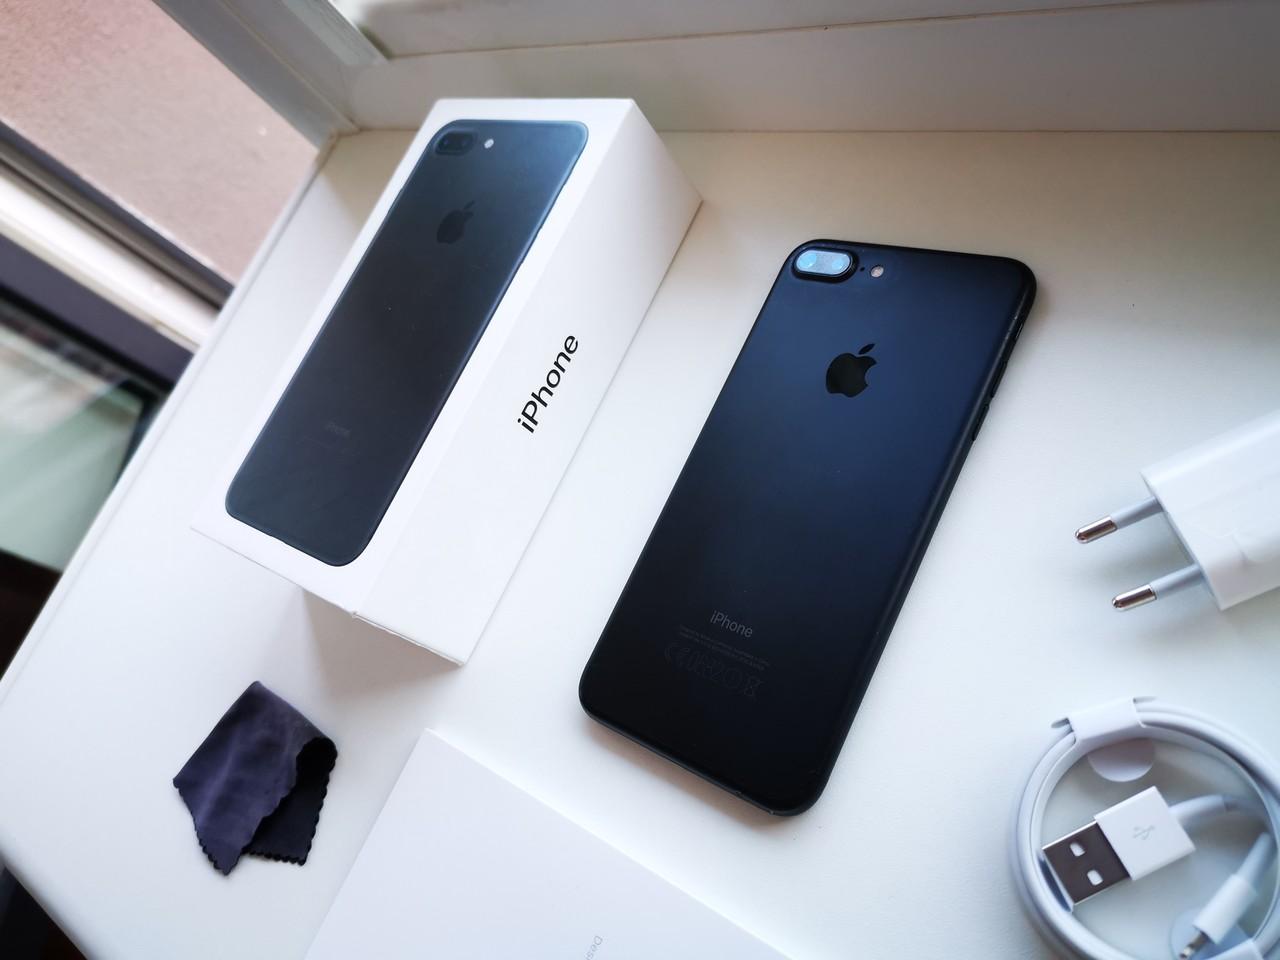 картинка Naudotas iPhone 7 Plus 128 GB от магазина Одежда+